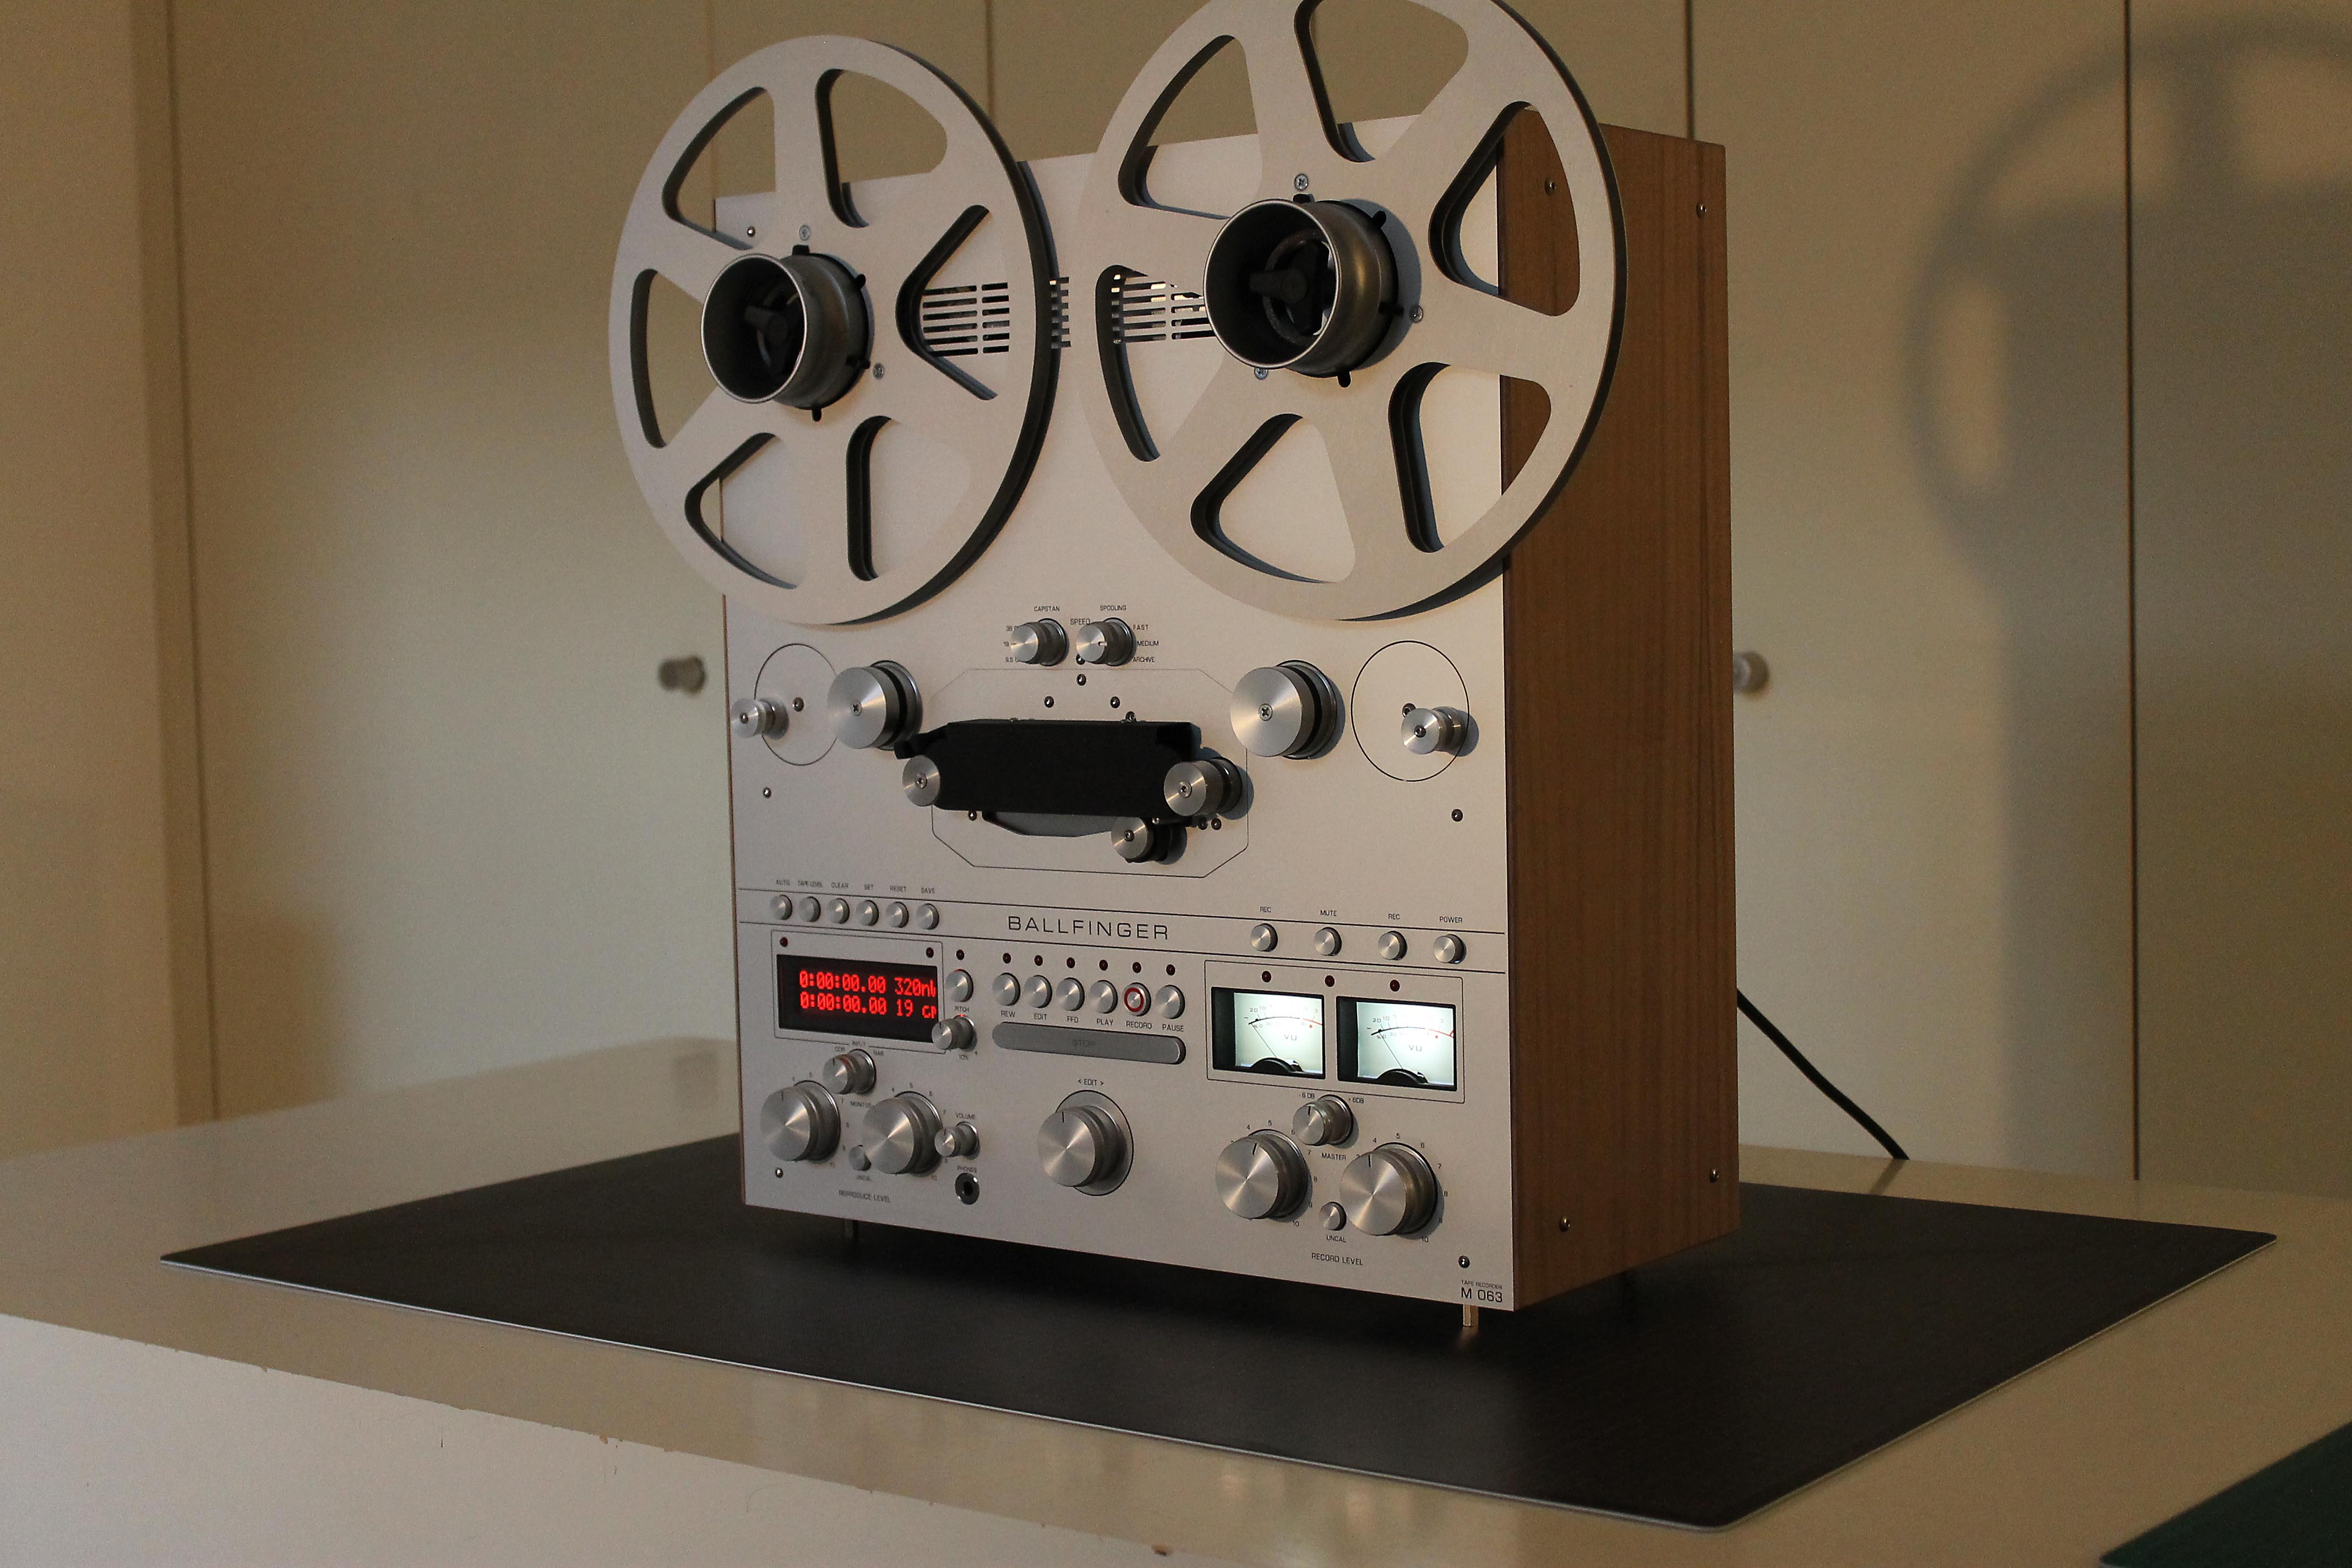 Ballfinger Reel To Reel Tape Machine To Land Ae Shortly Audio Exotics